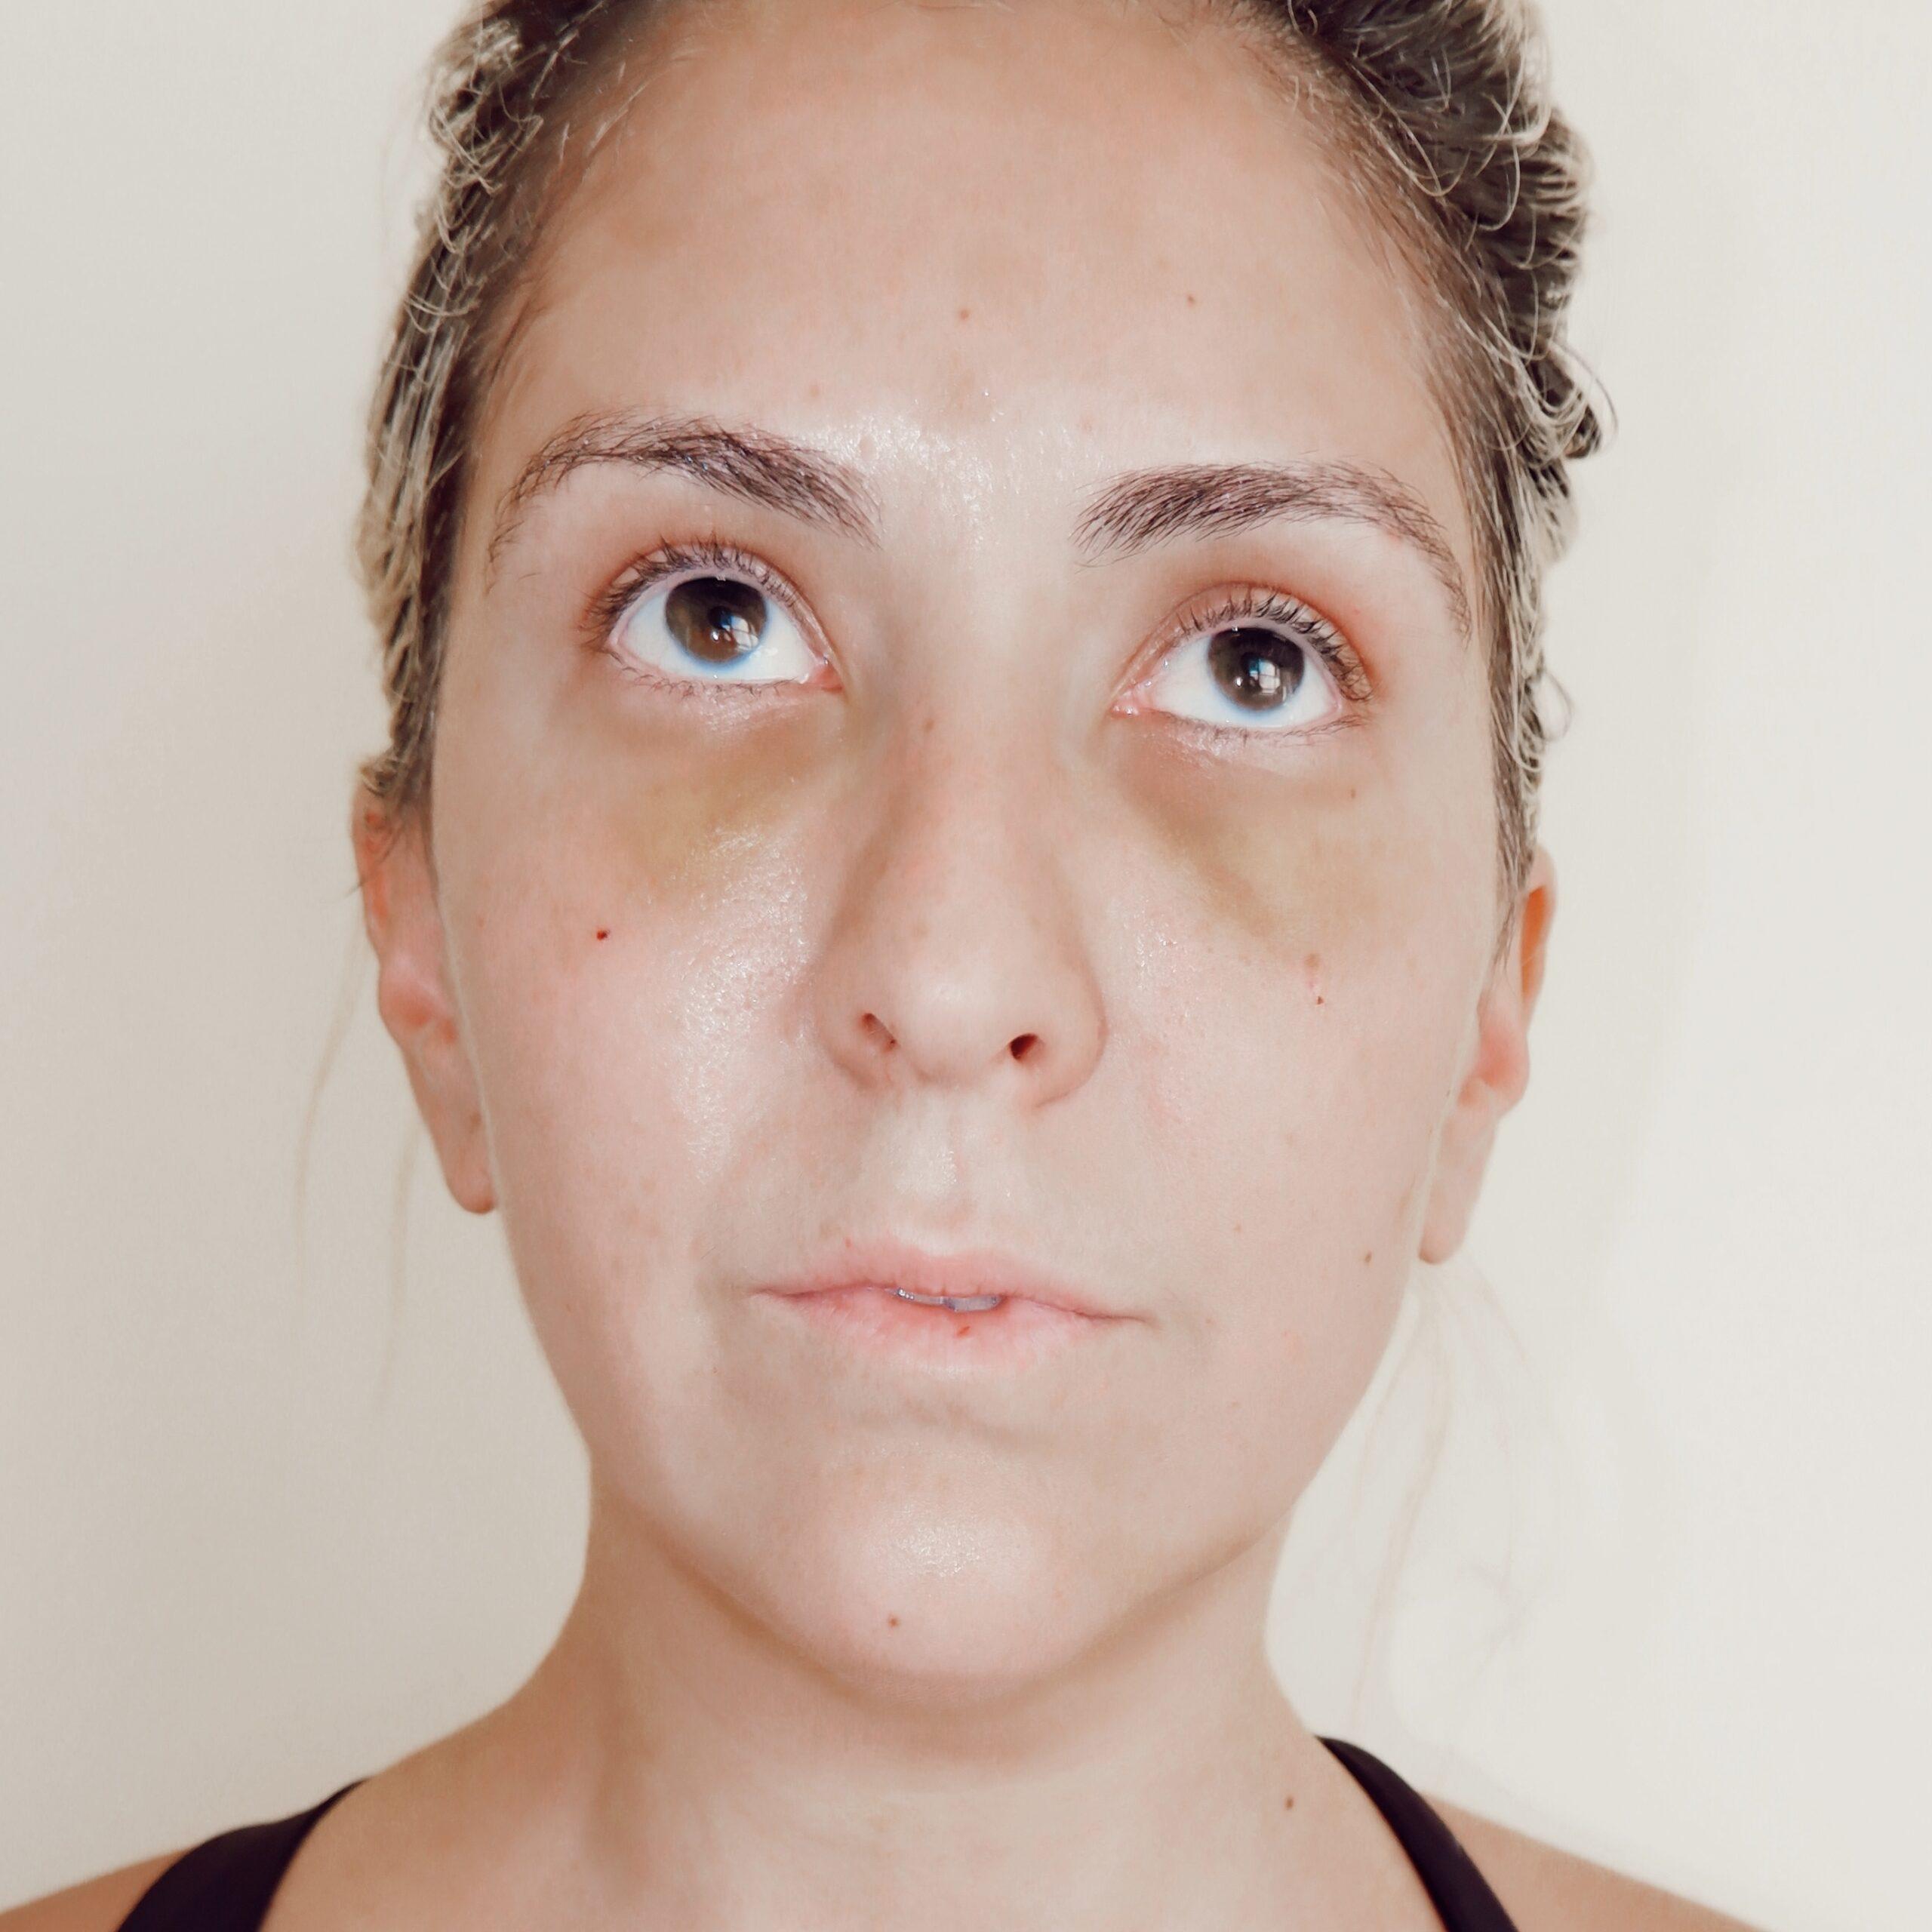 Liposuction Before and After Photos, Lipo Photos, Dr. Tanya Judge, Kat Ensign, Katwalksf, SF Plastic Surgery, San Francisco Plastic Surgeon, Best Plastic Surgeon San Francisco